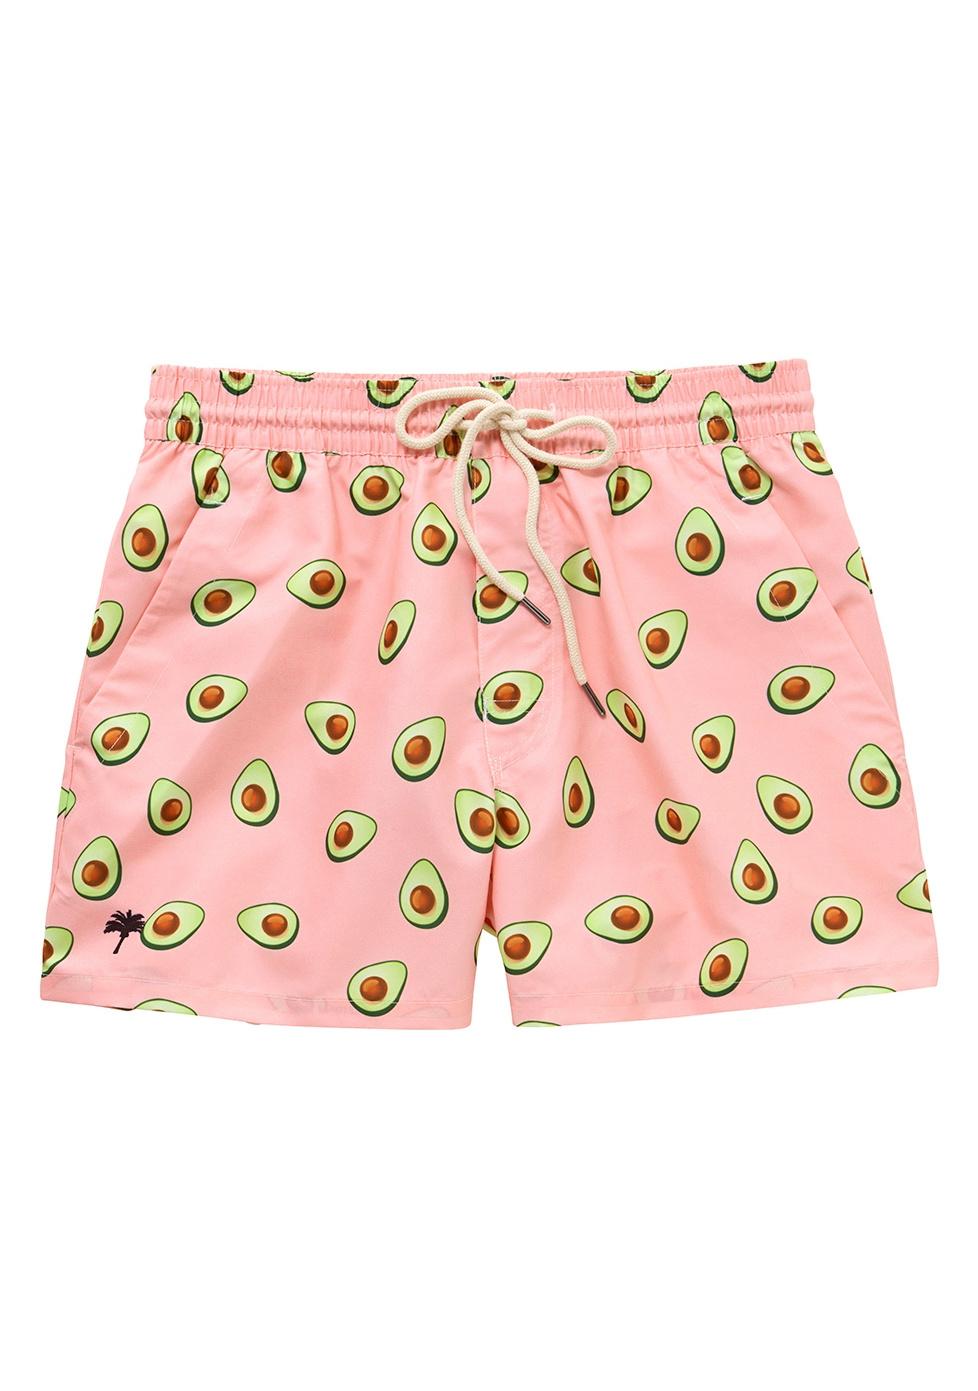 c404760a91 OAS OAS Swim Short Pink Avocado - Les Deux Frères